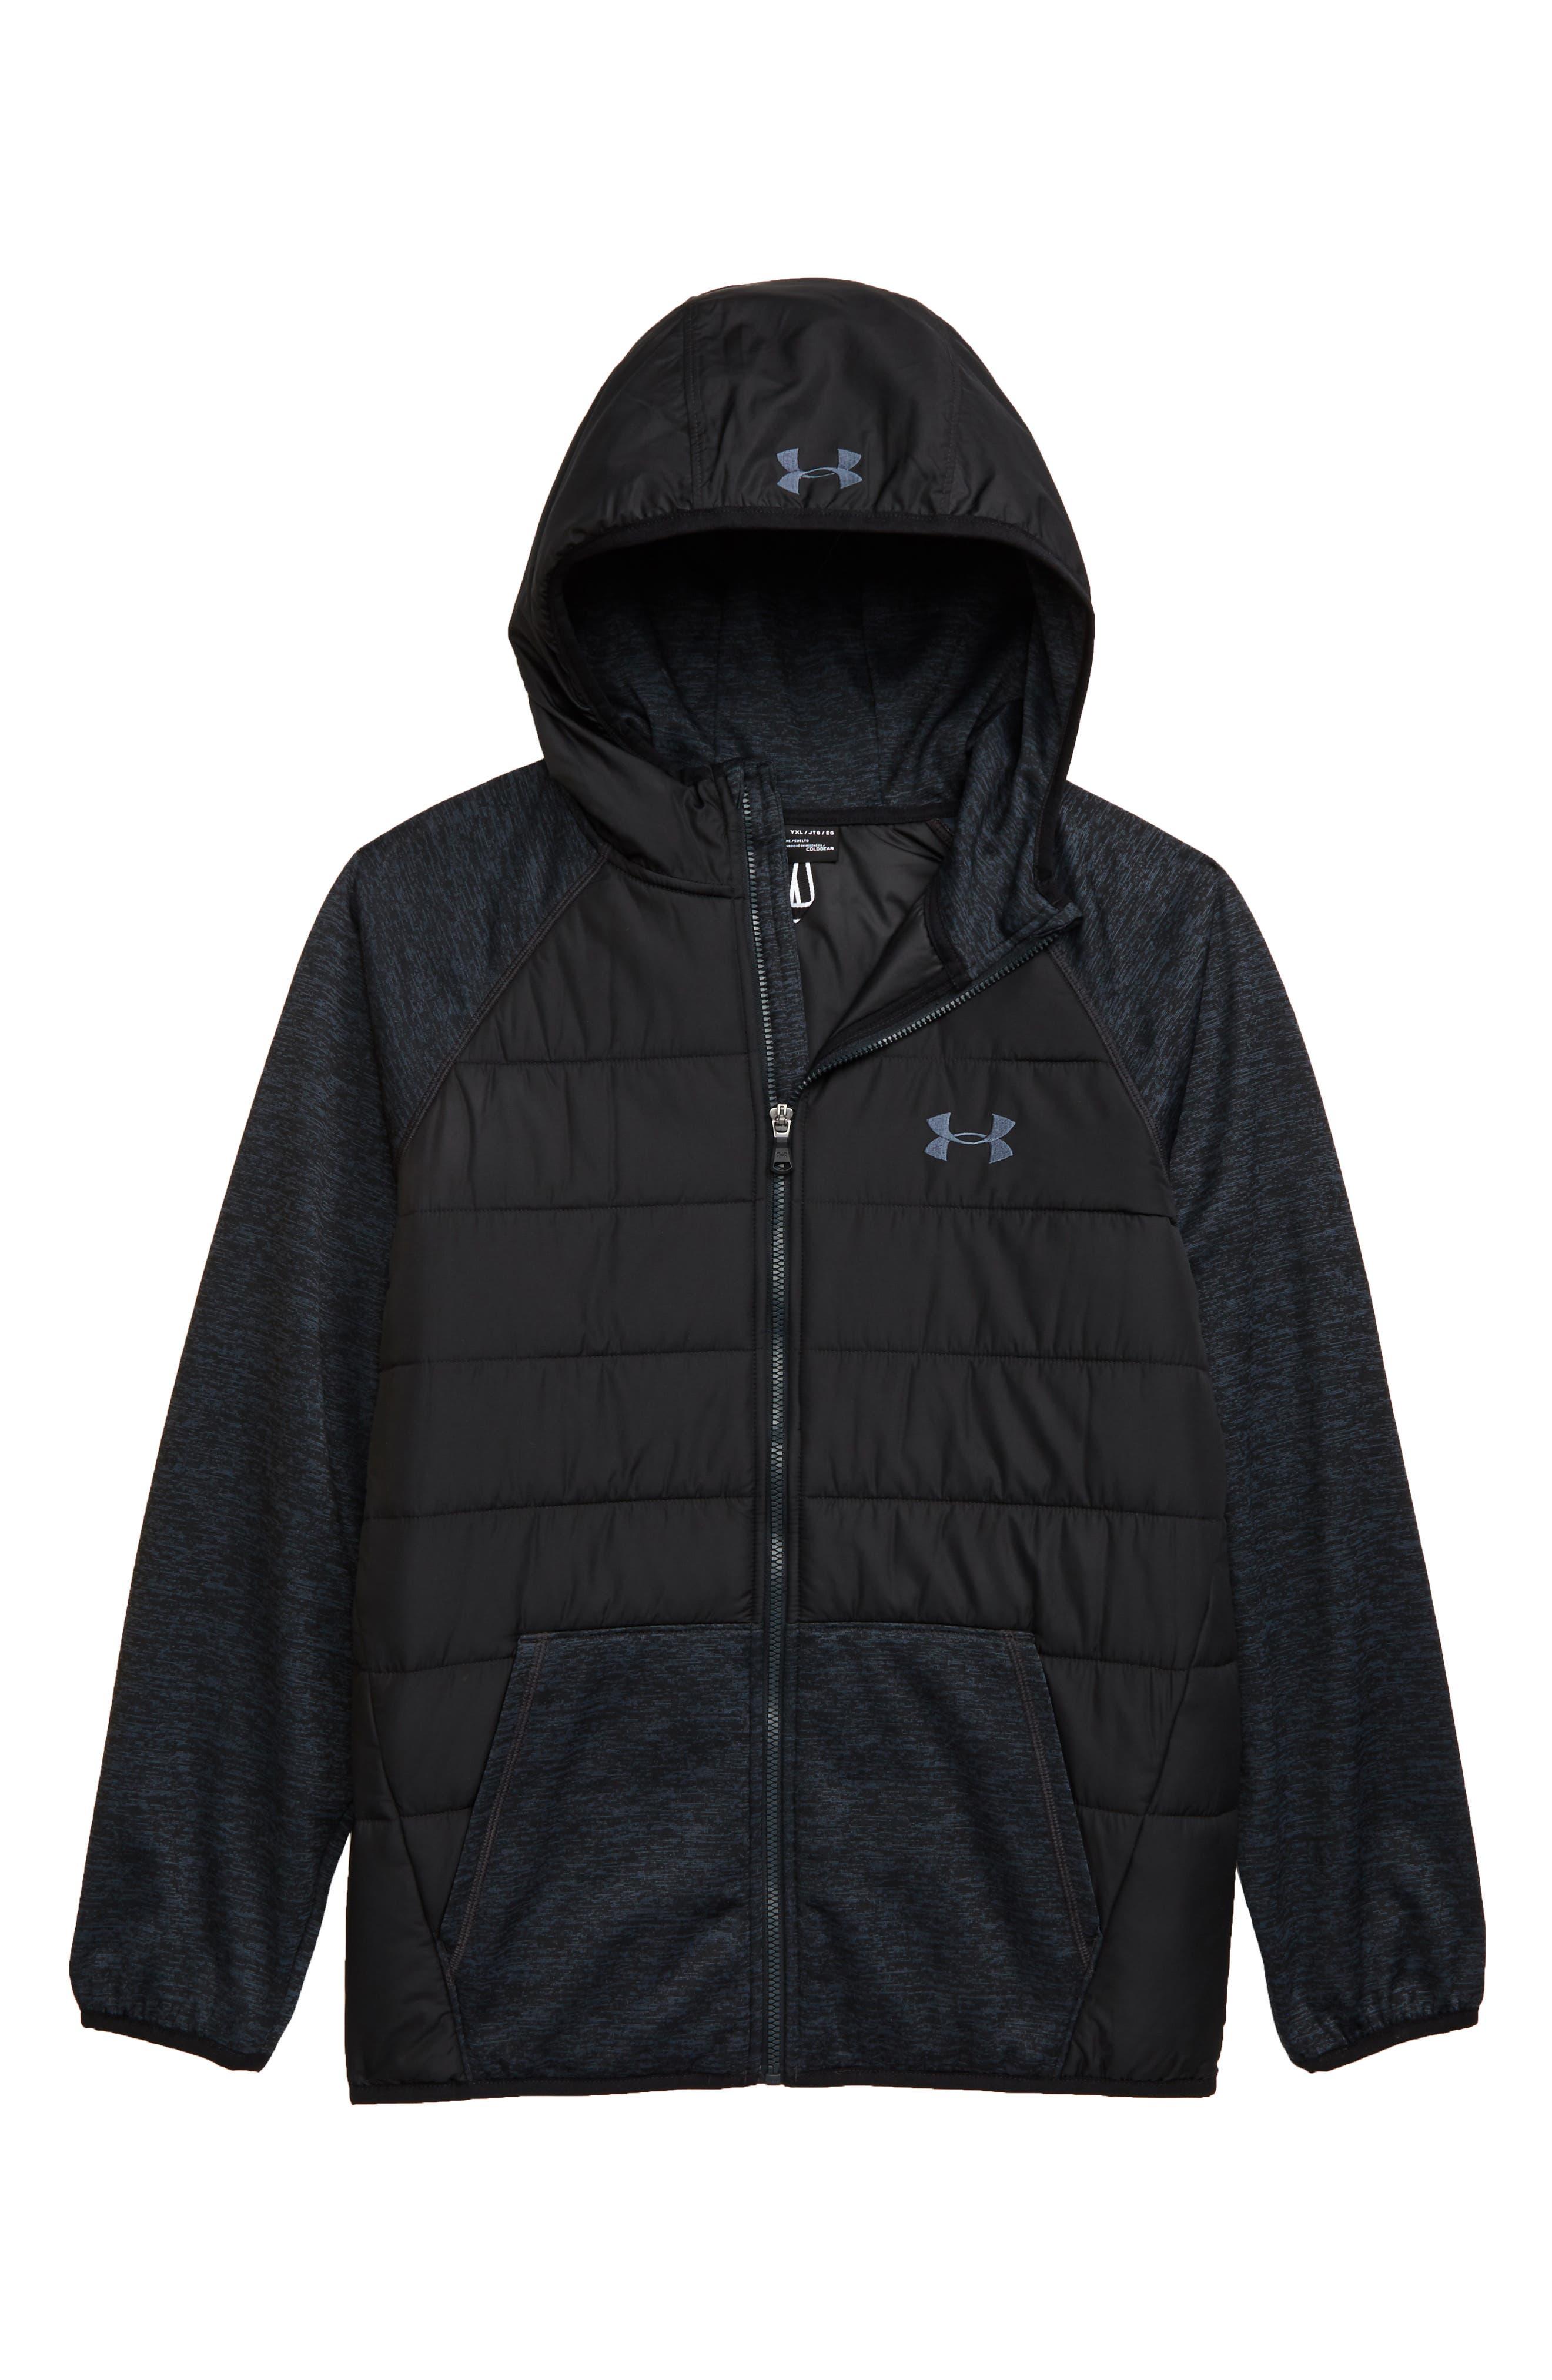 boys under armour jacket